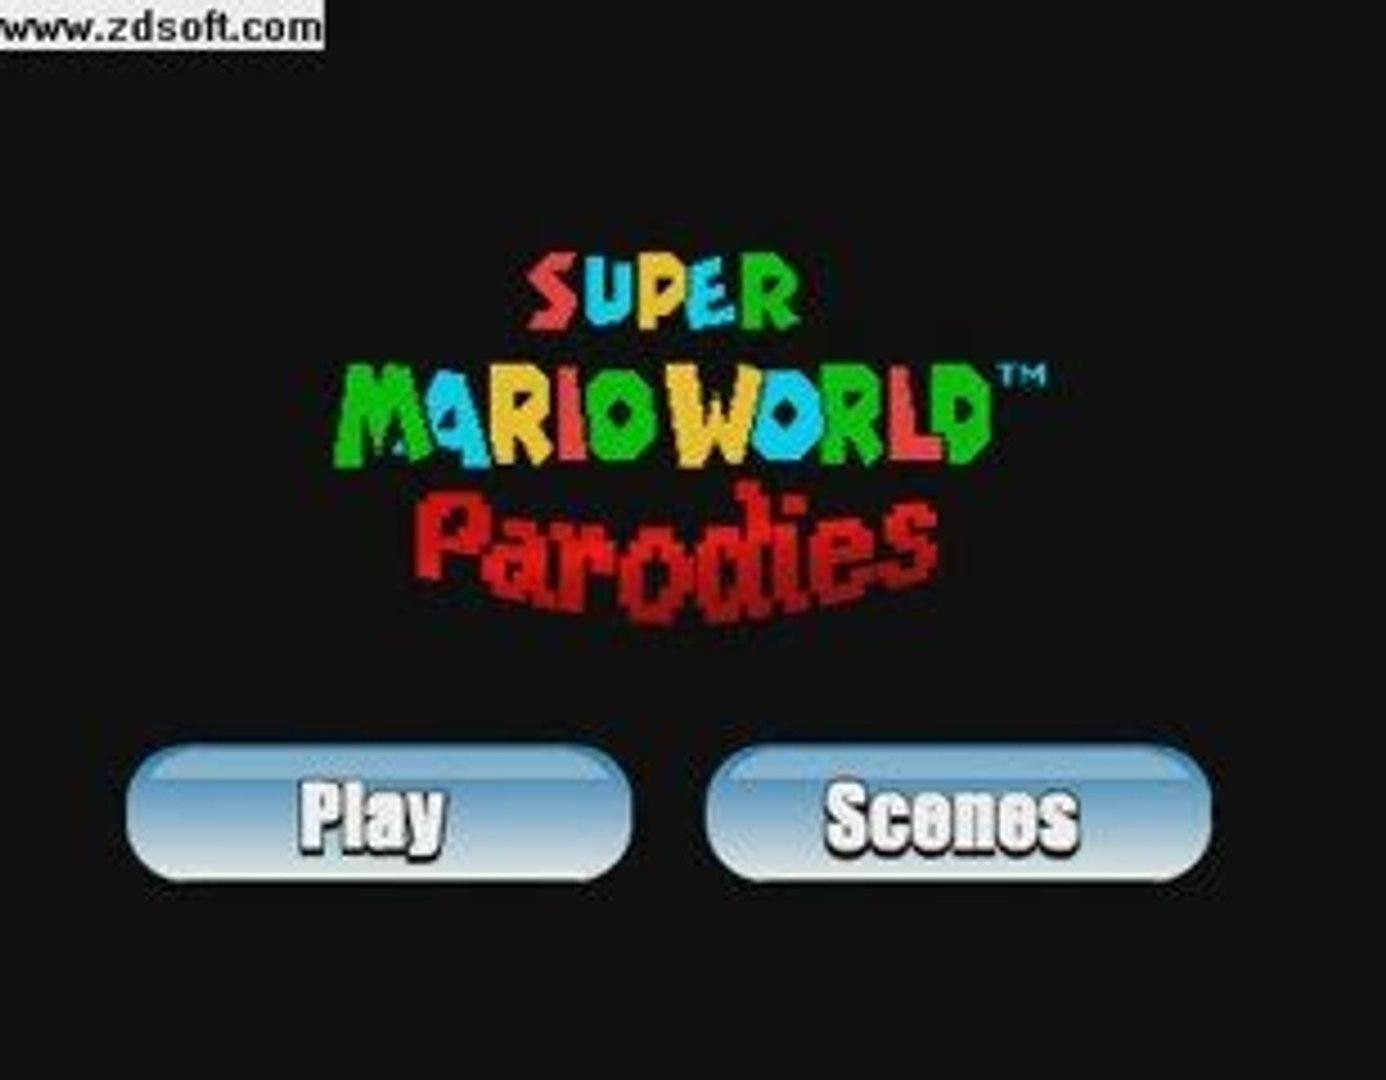 Mario parodies